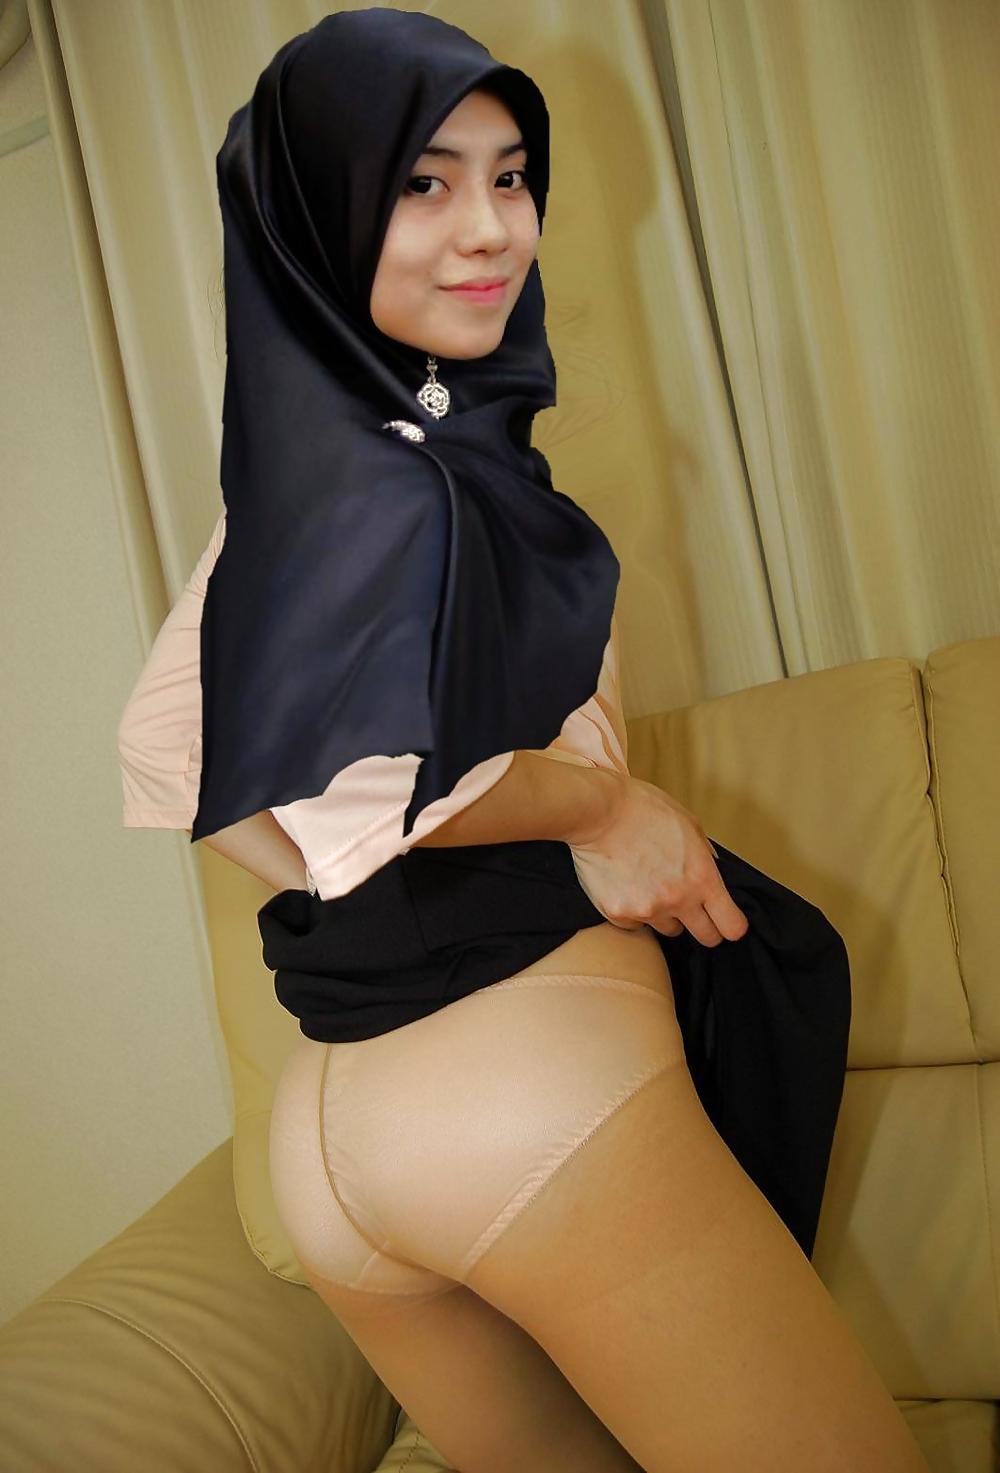 Muslim women hijab ass upskirt gallary